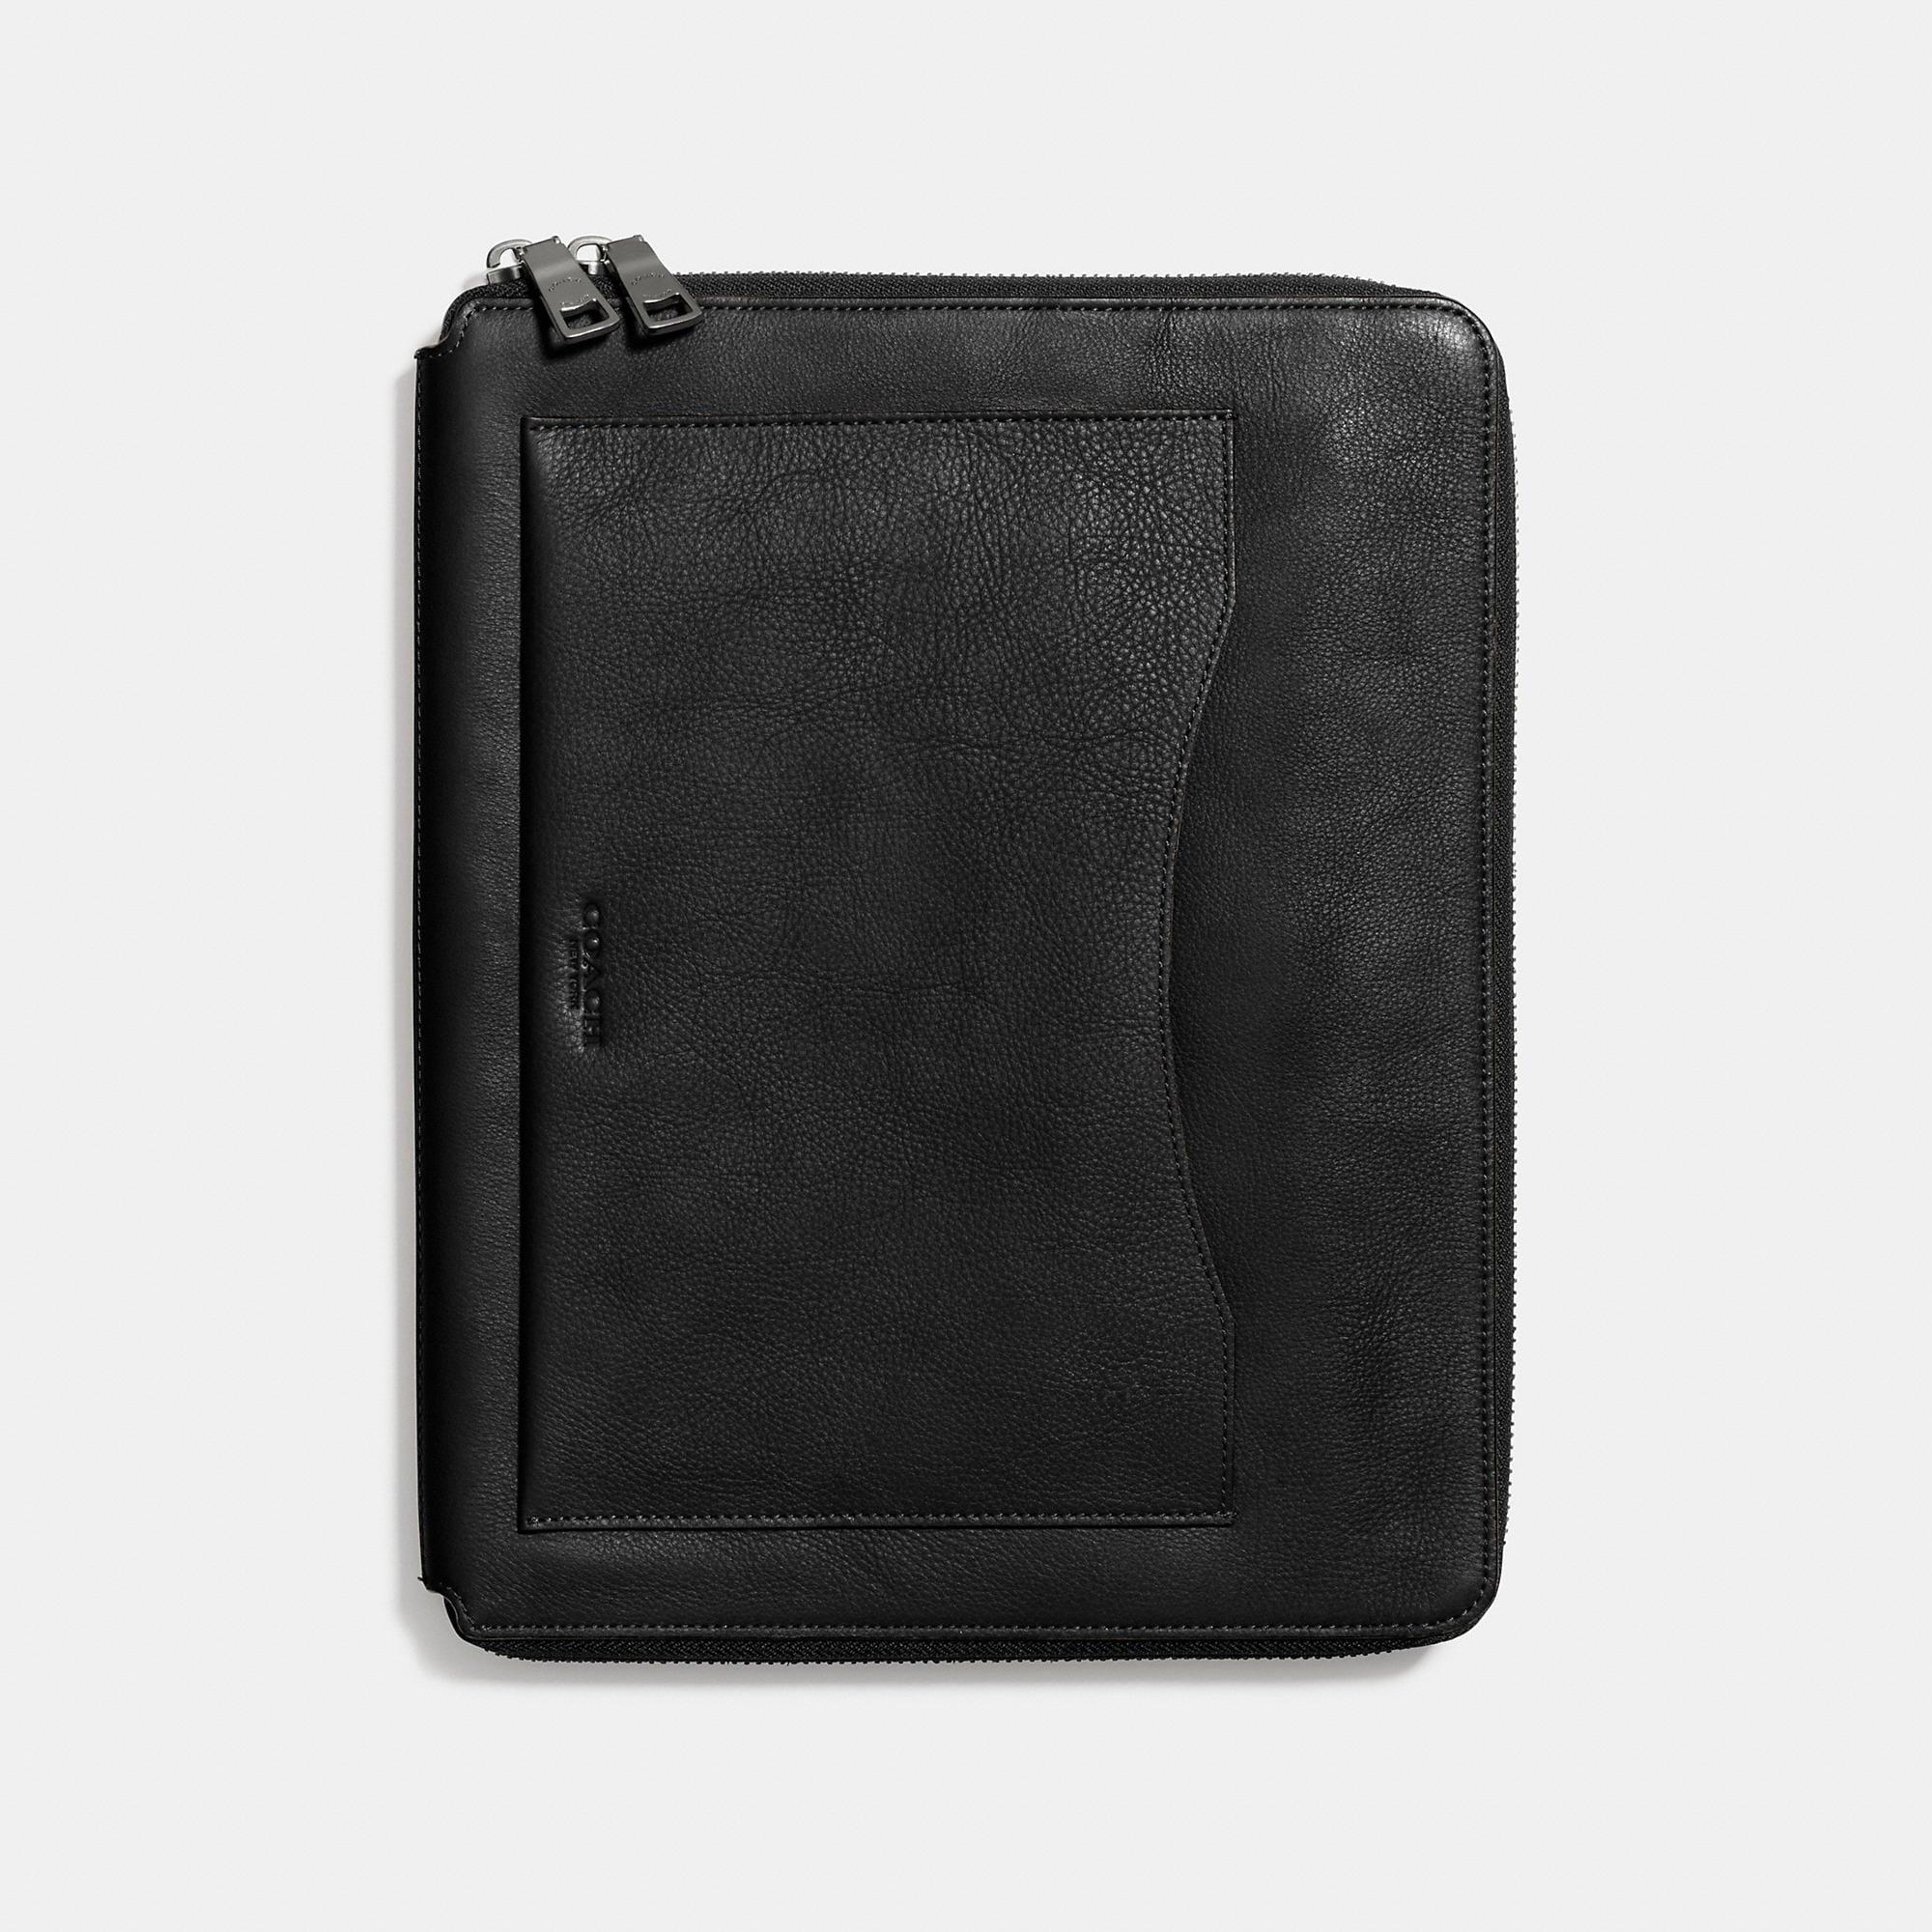 Coach Tech Case In Pebble Leather